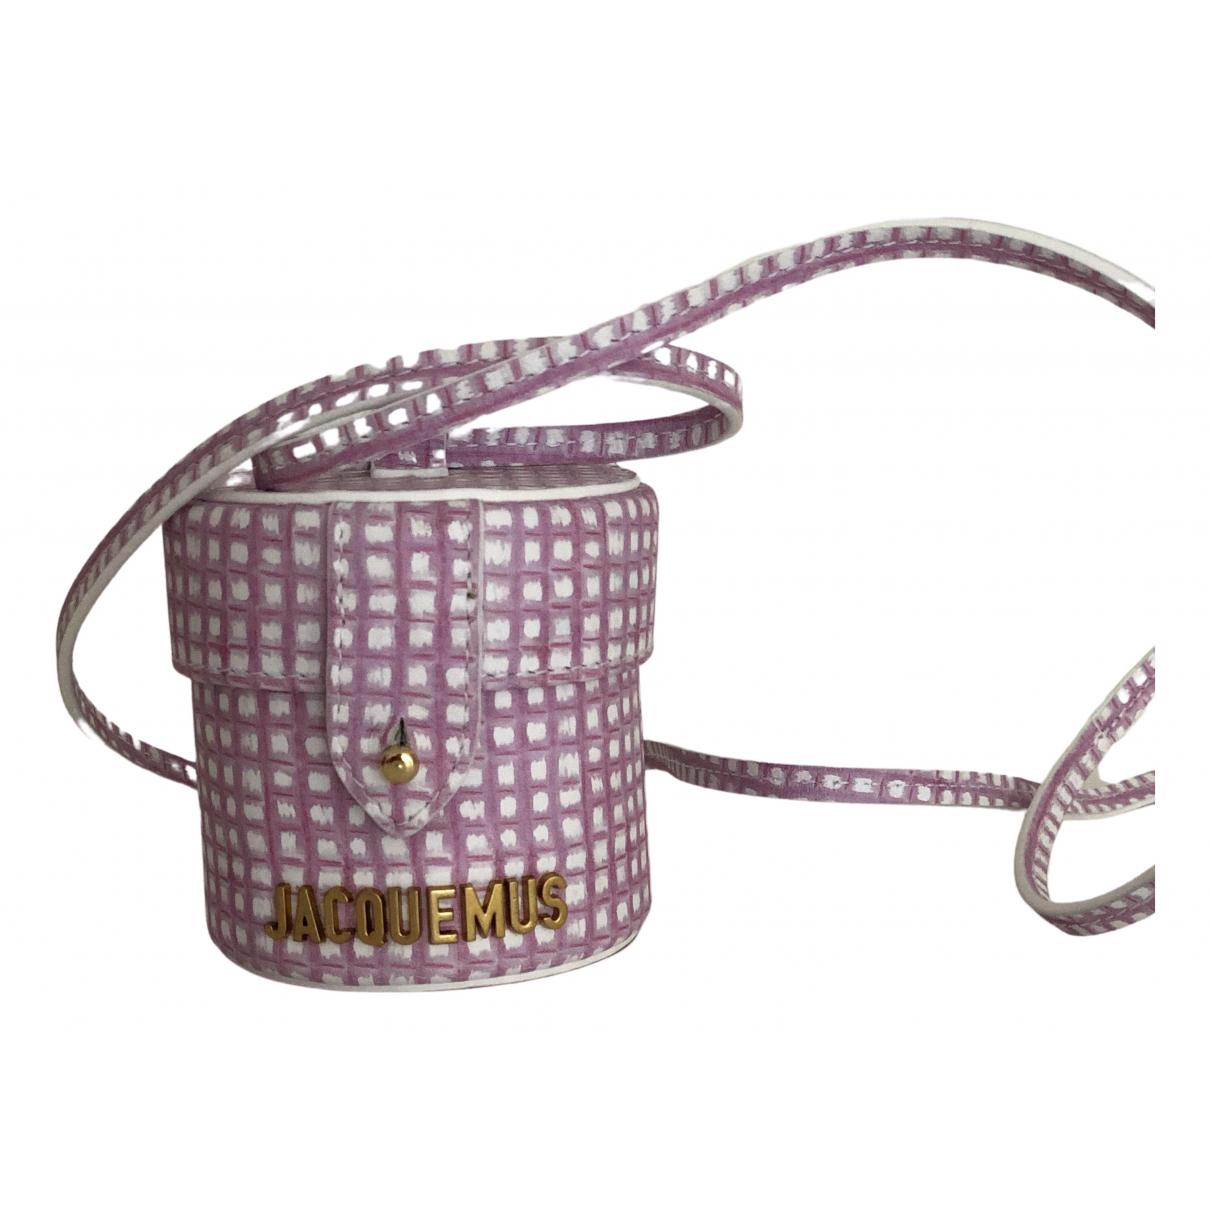 Jacquemus Le Vanity Pink Leather handbag for Women N